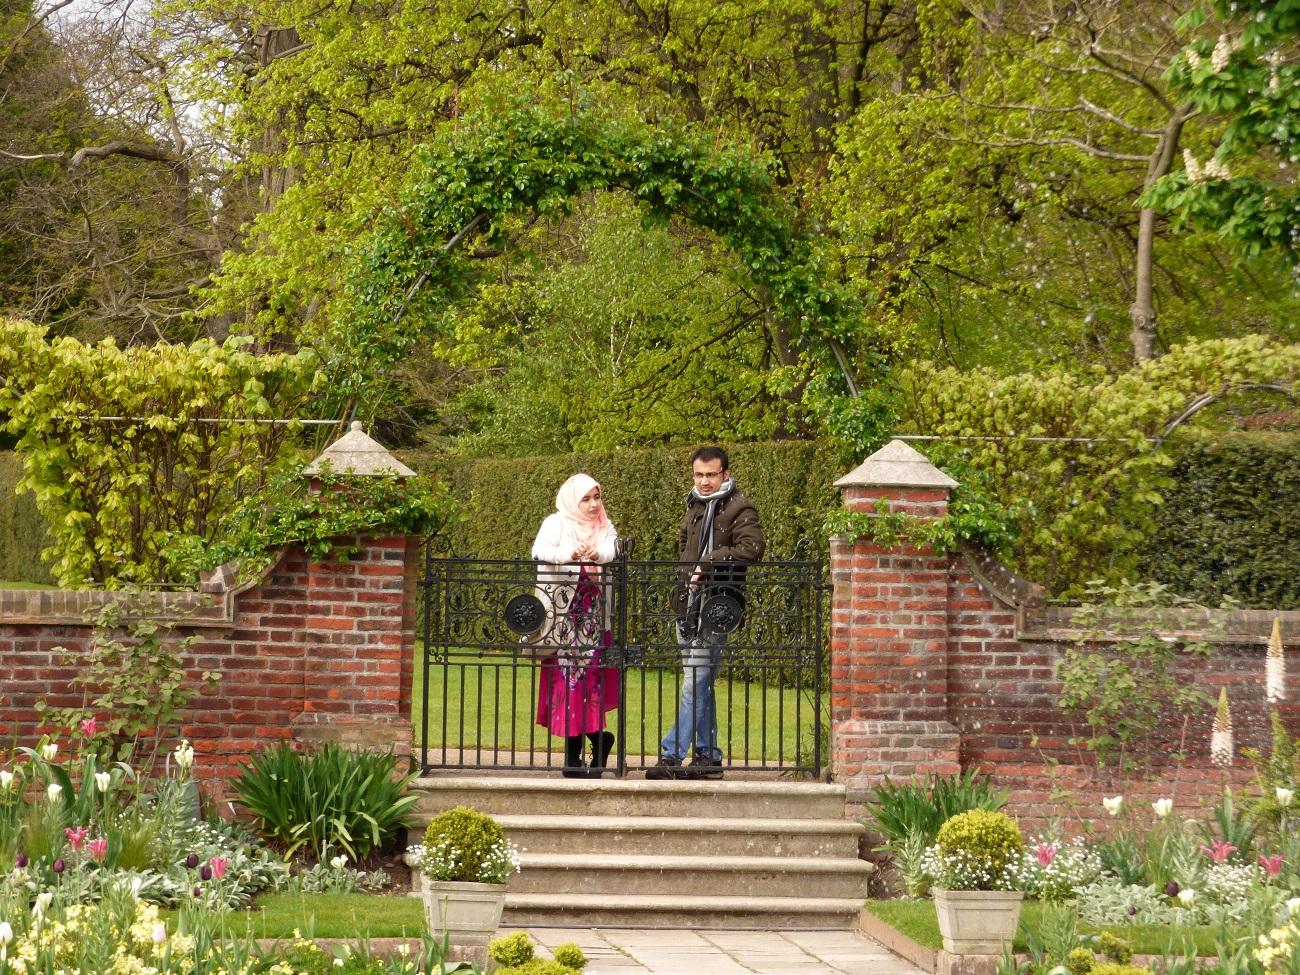 20170407_Westminster_Kensington-Palace-Memorial-Garden_Reminising-perhaps